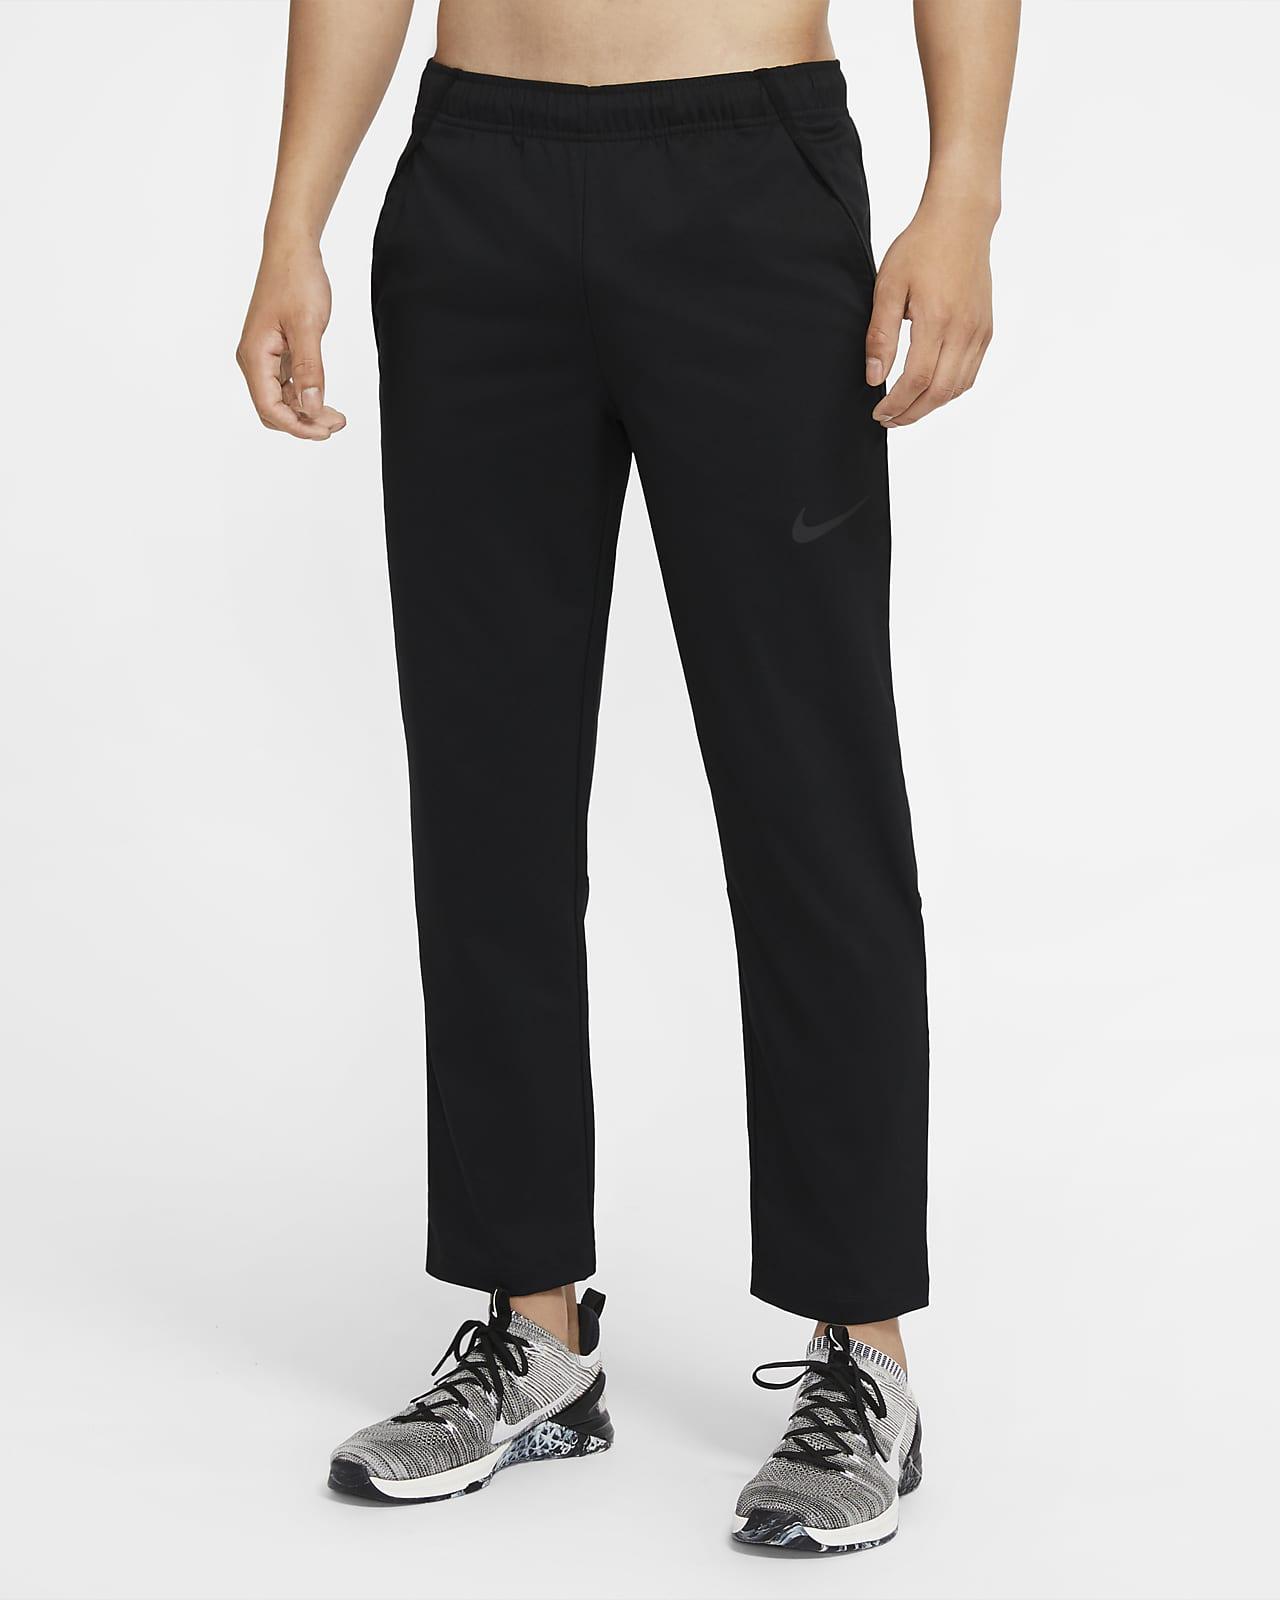 Nike Dri-FIT 男款梭織訓練長褲